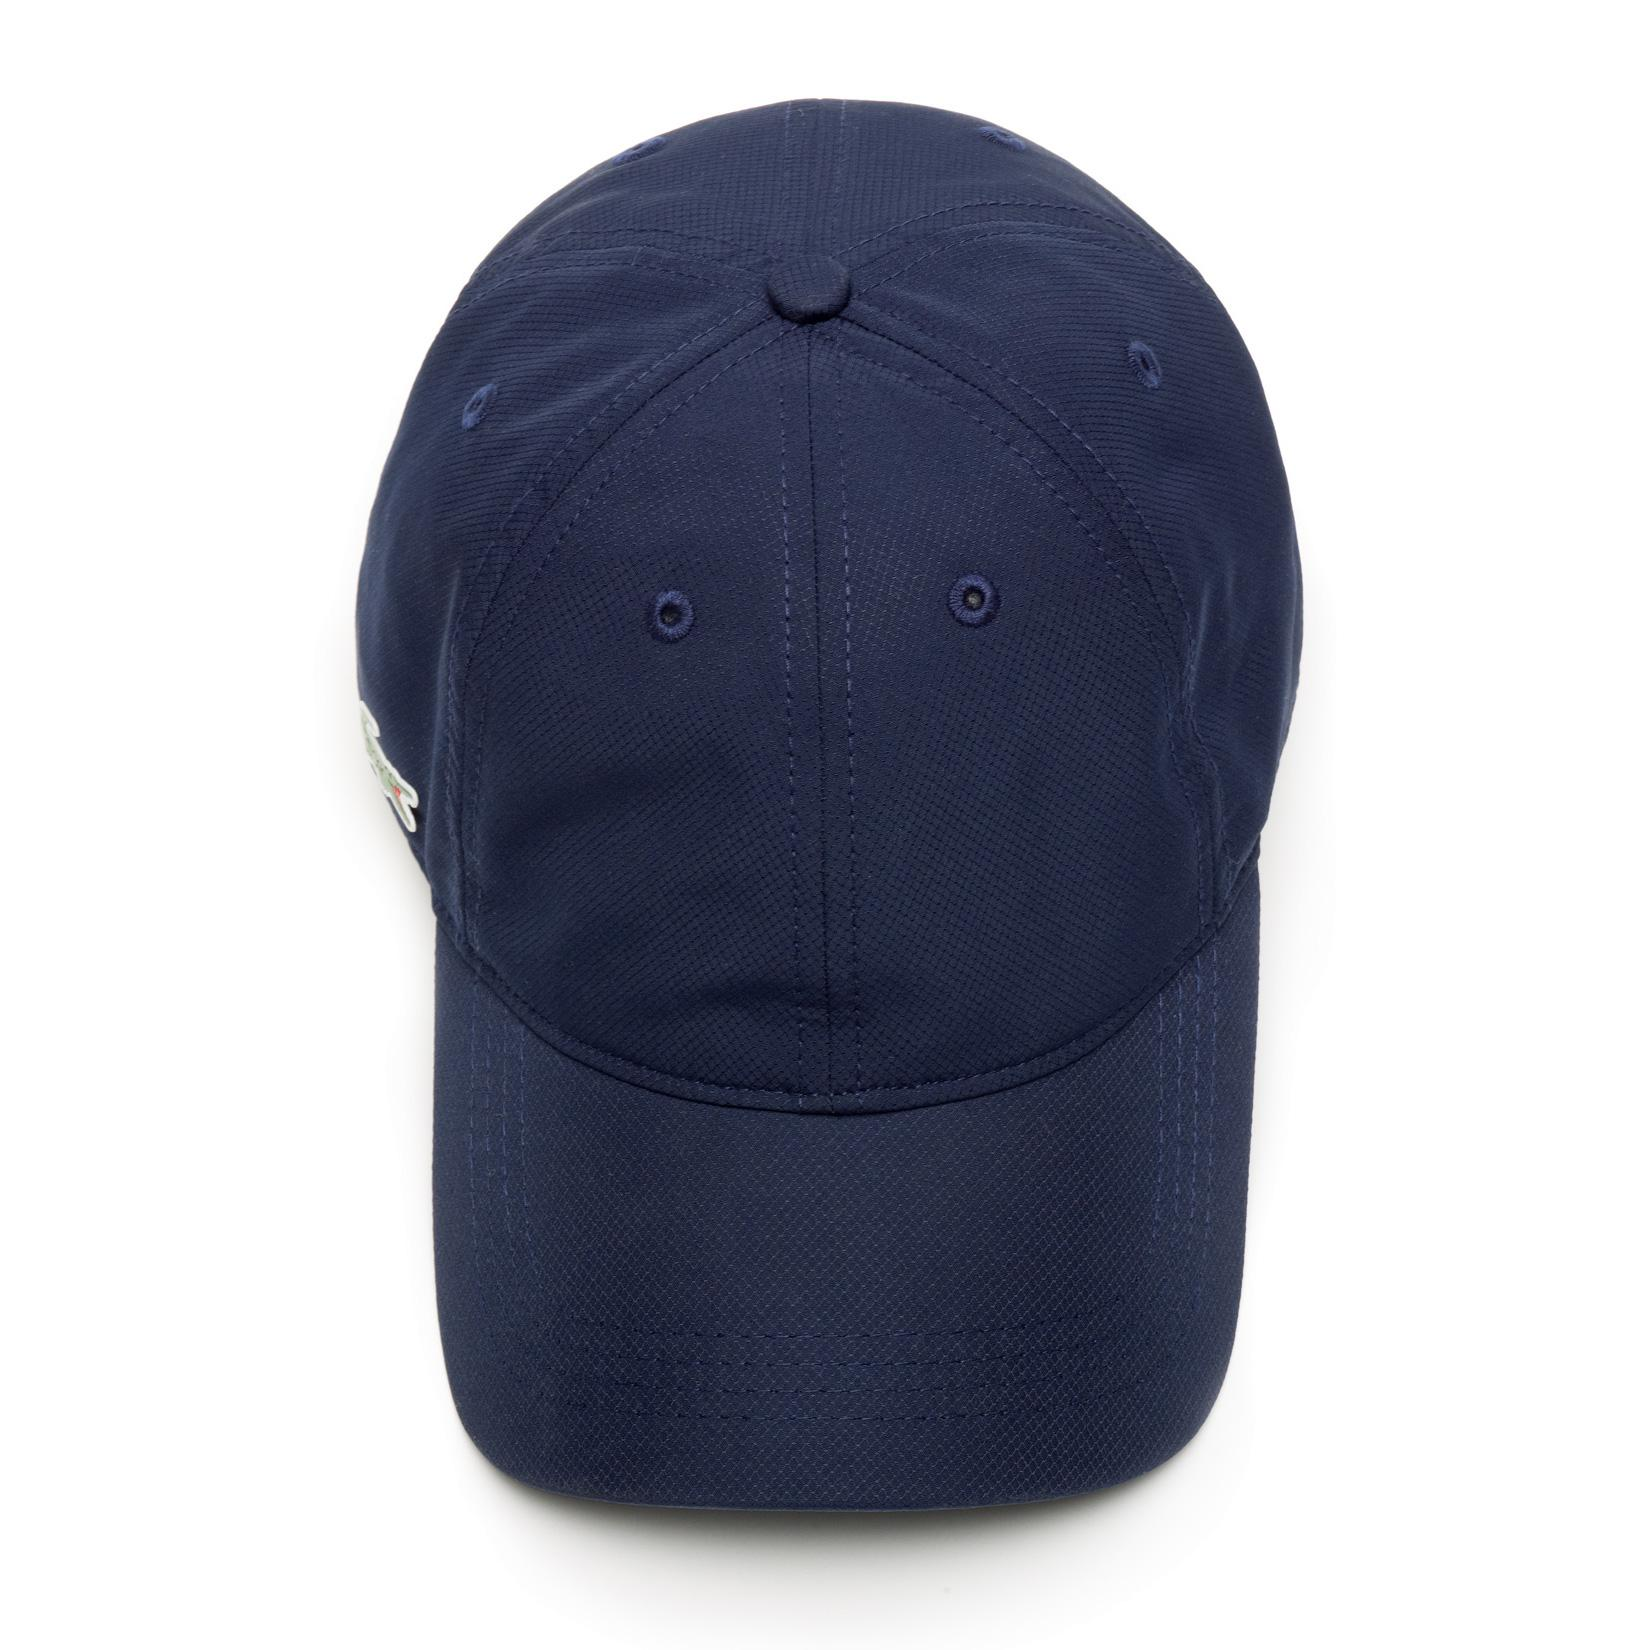 cbcbeb71962 Lacoste Sport Cap in Solid Diamond Weave Taffeta - Navy Blue ...